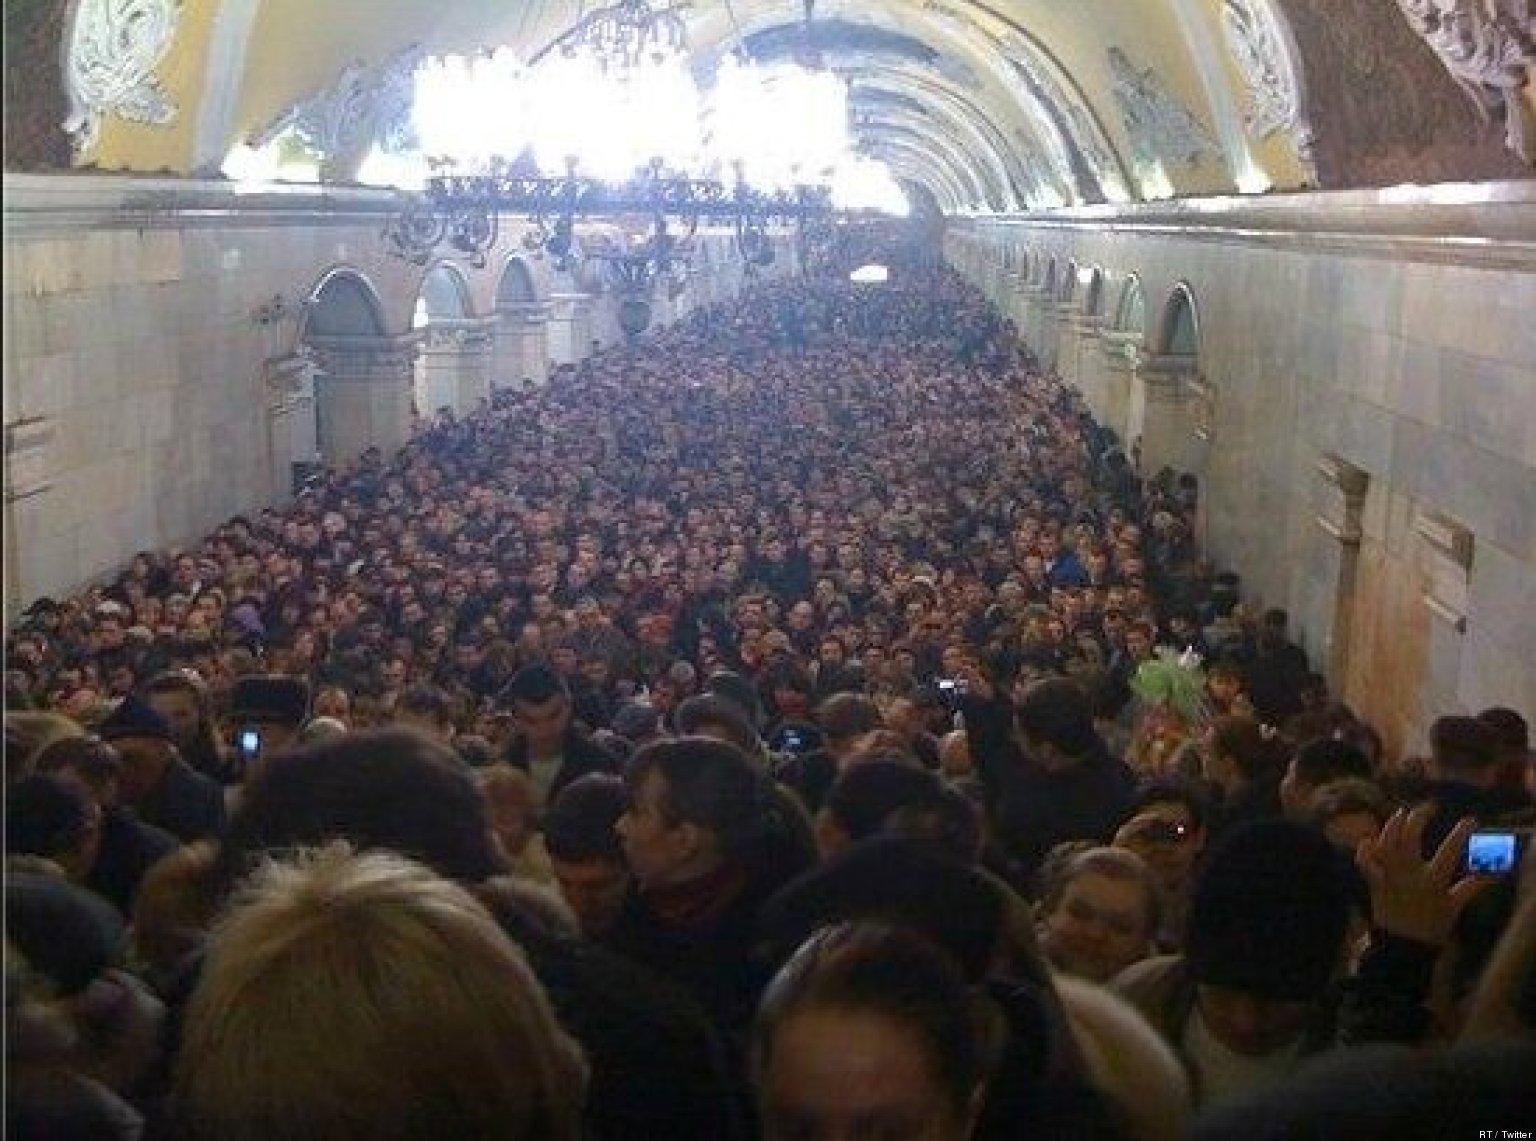 http://i.huffpost.com/gen/1173852/images/o-MOSC-facebook.jpg